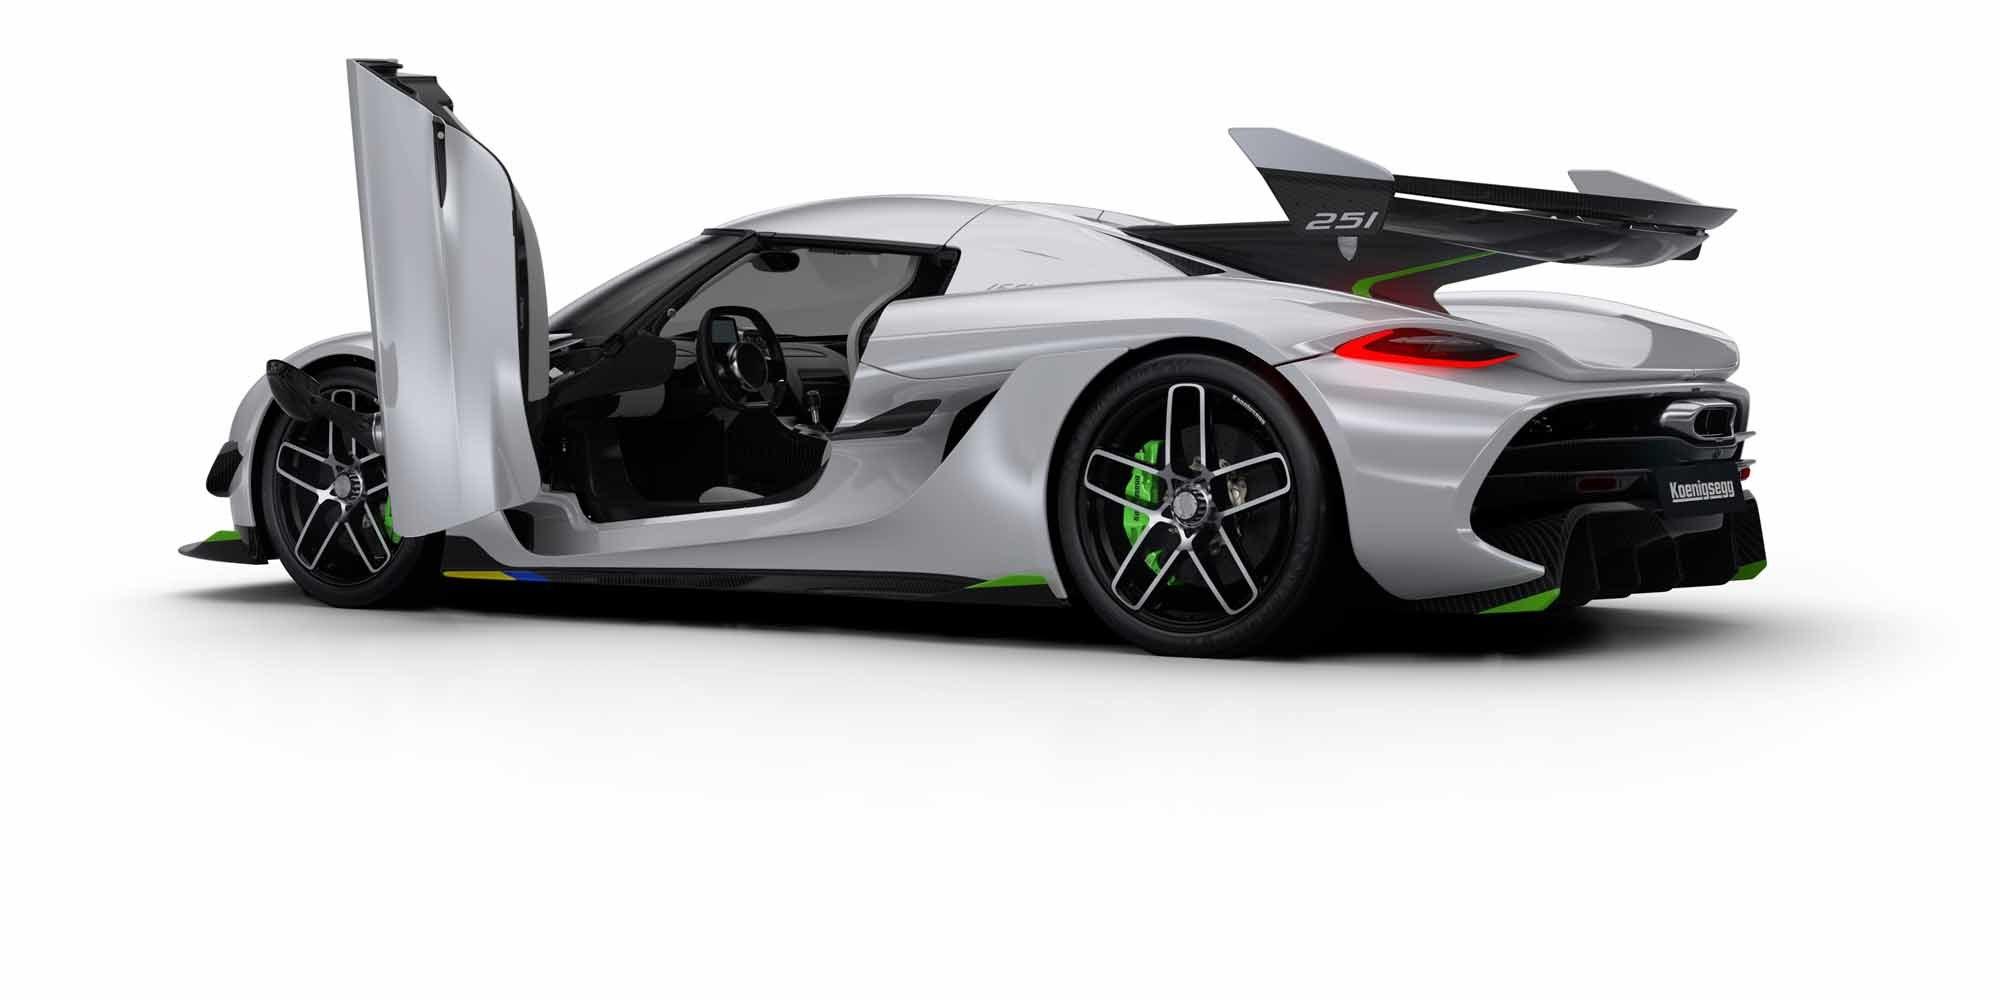 C:\Users\Jialing\Desktop\20190403\20190403\639-Car Guide\Koenigsegg Jesko - half\5c80b363ec05c4756200007b.jpg